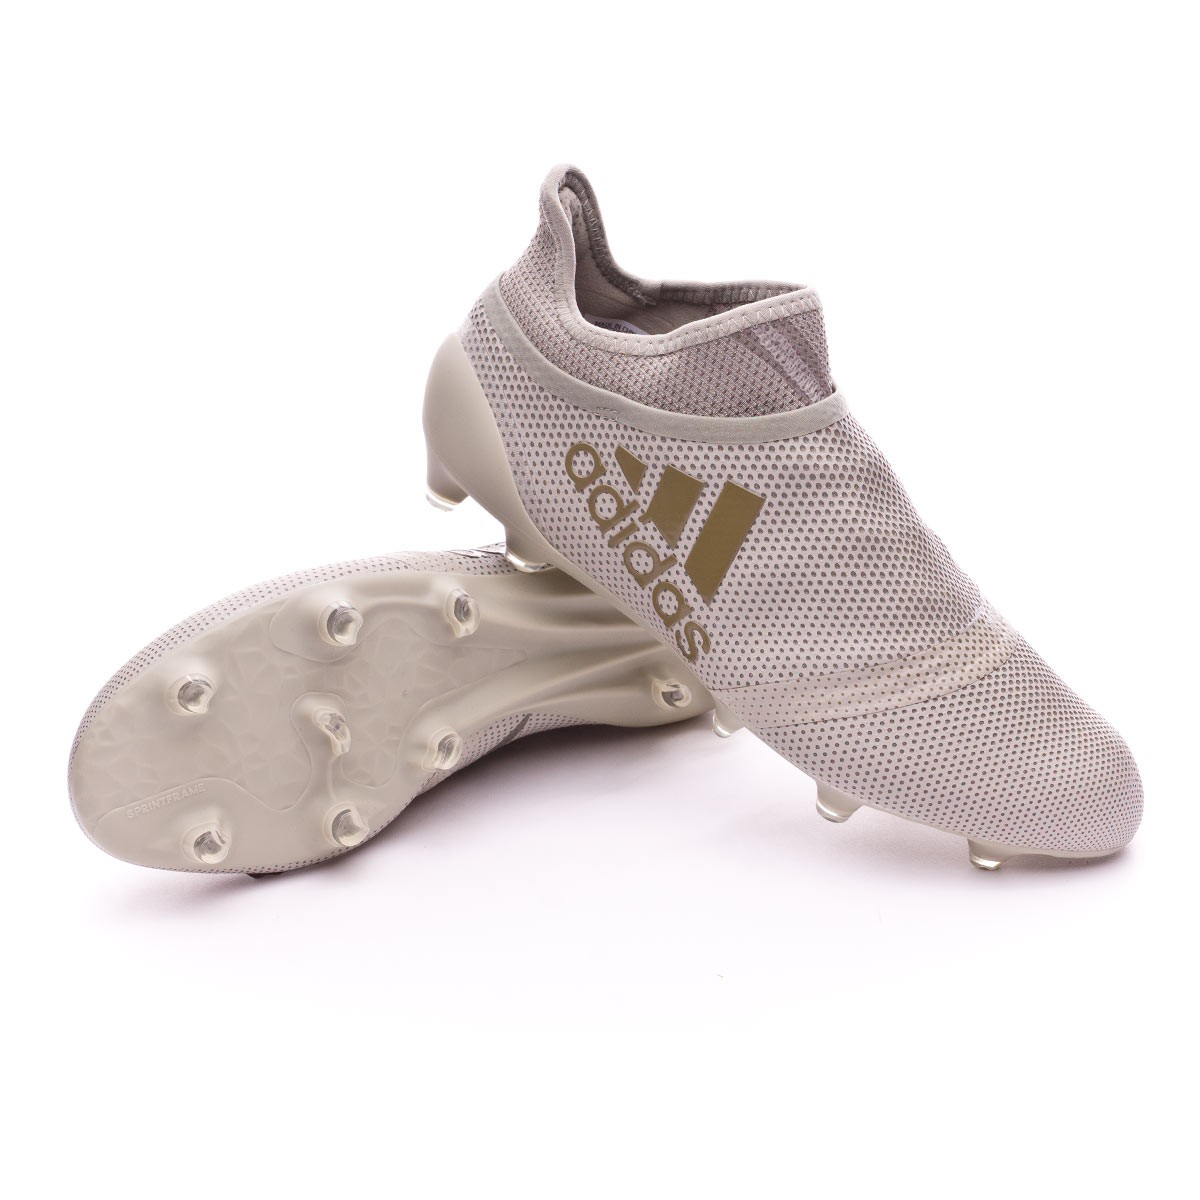 Chuteira adidas X 17+ Purespeed FG Sesame-Clay - Loja de futebol Fútbol  Emotion 9bdec2c2d0b82